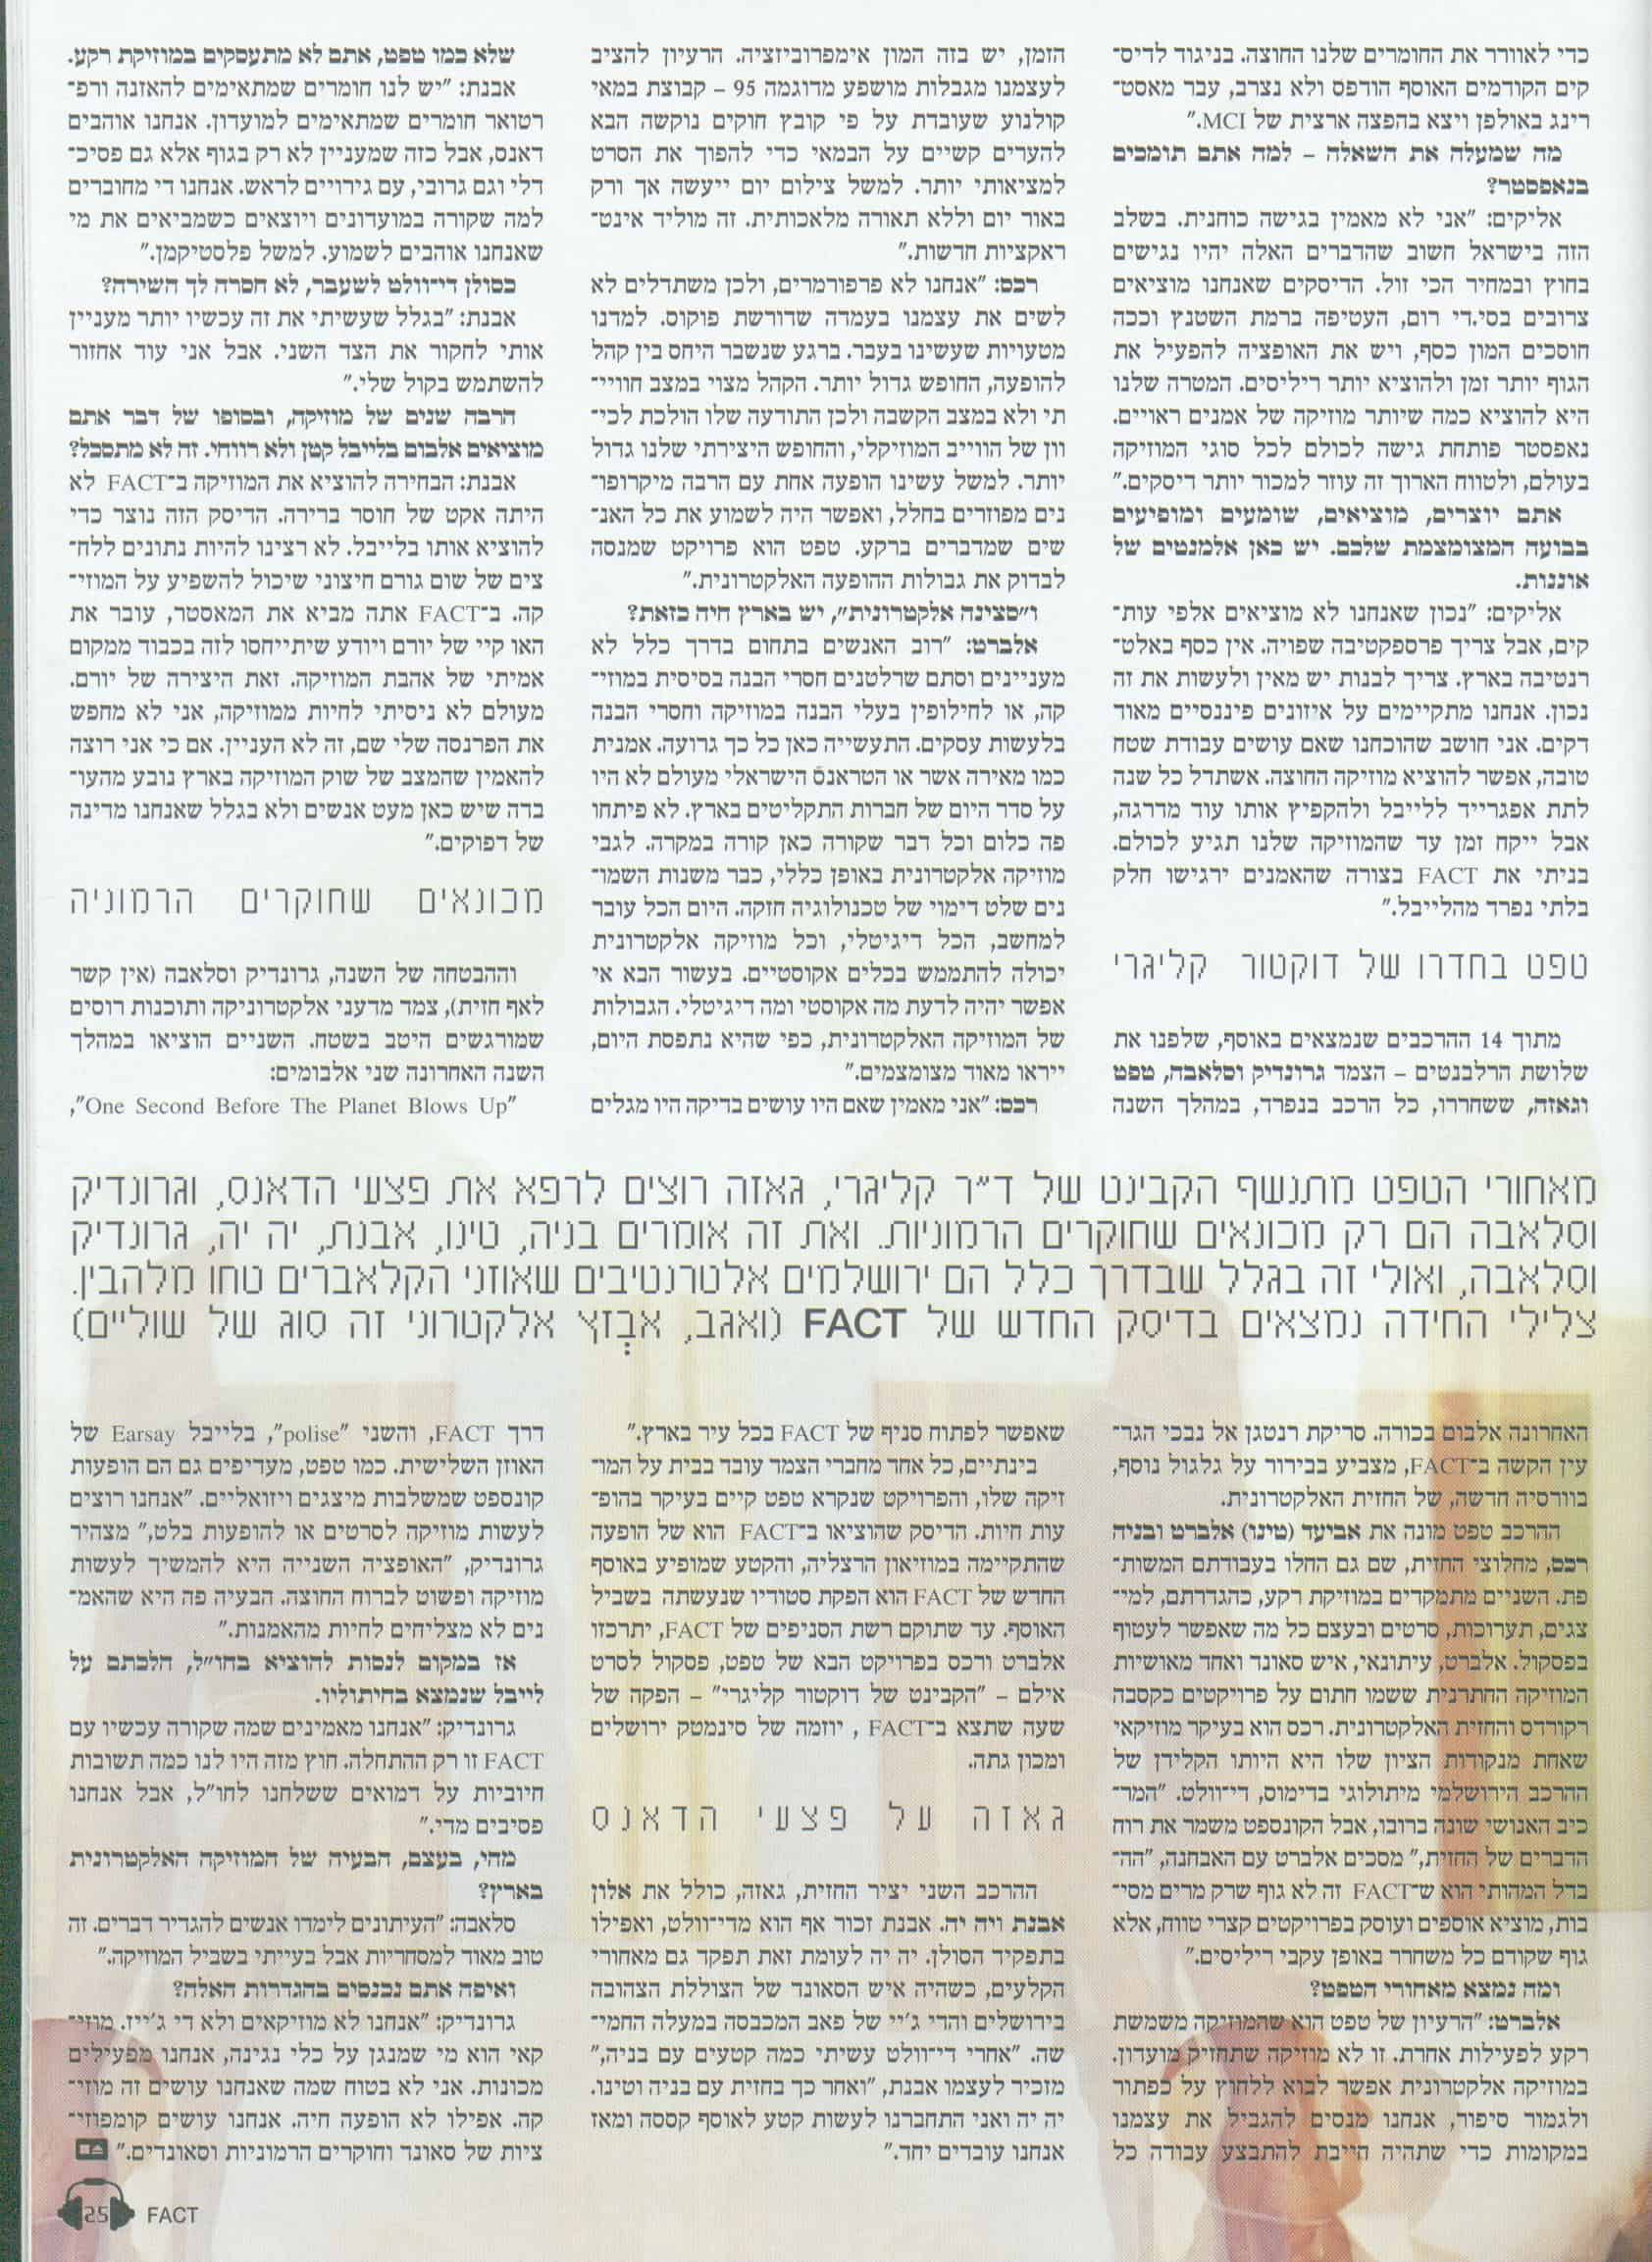 dj3 - Avuz Electroni, DJ Ha-Ir, Fact records, 06.02.2001